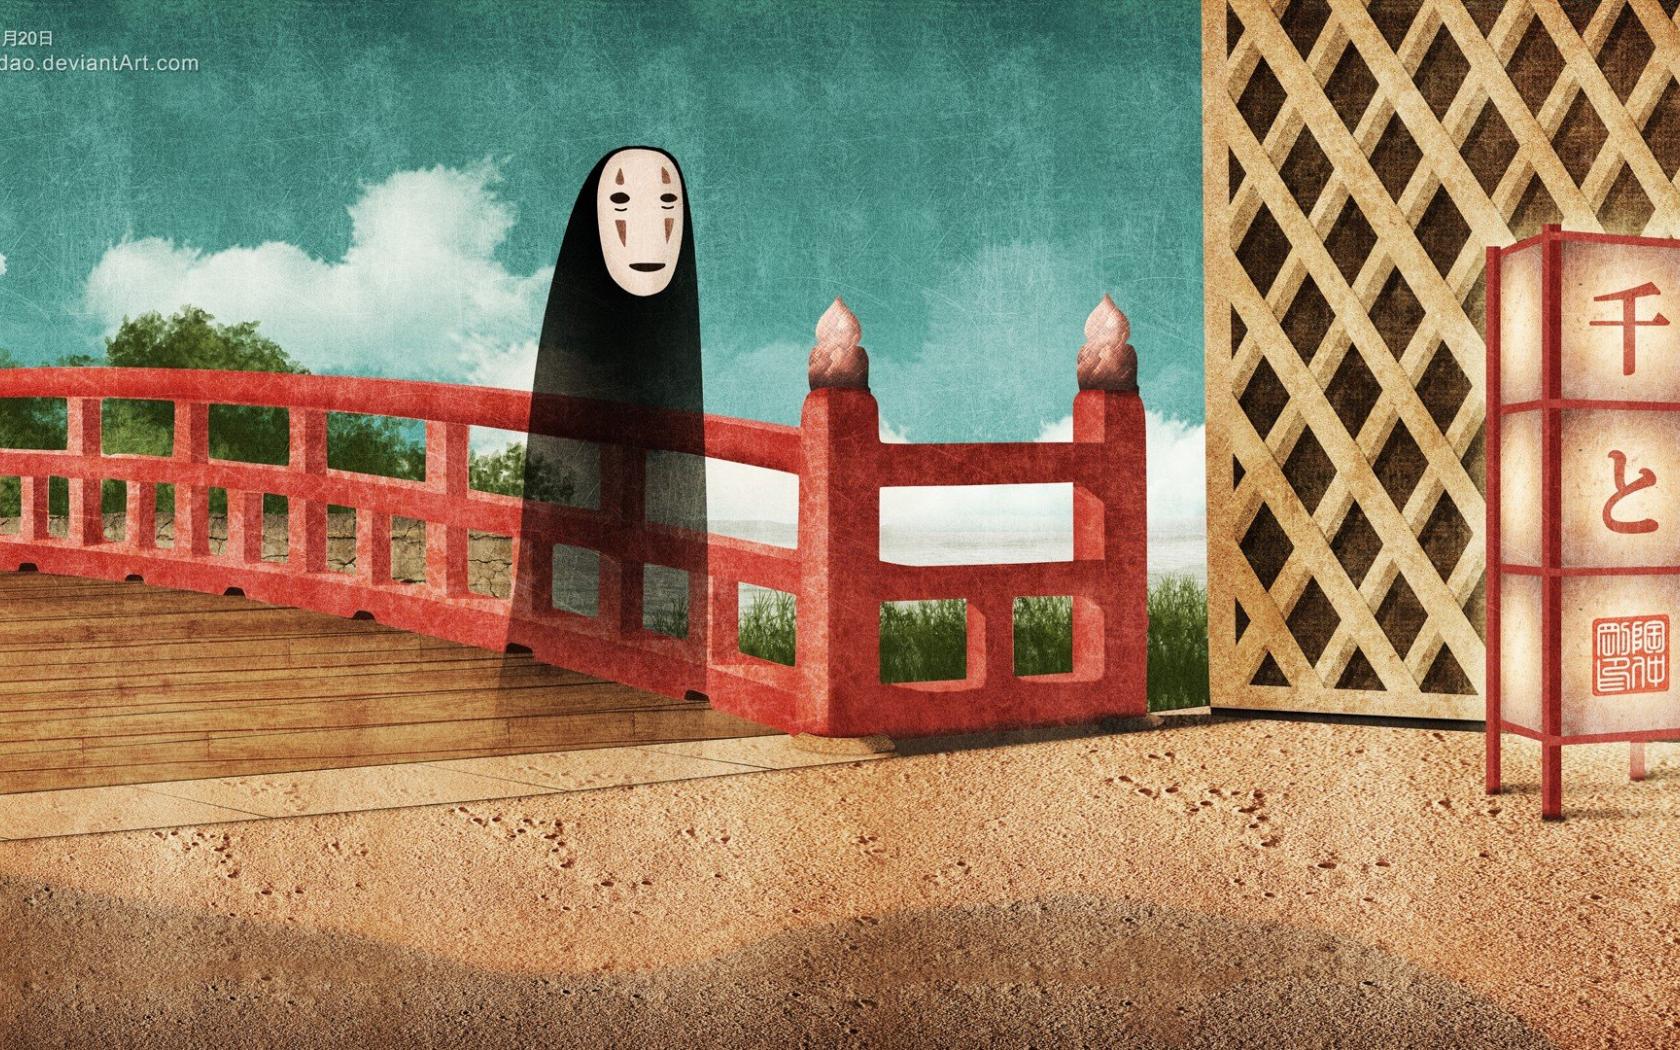 Free Download Spirited Away No Face Studio Ghibli Anime Chihiro